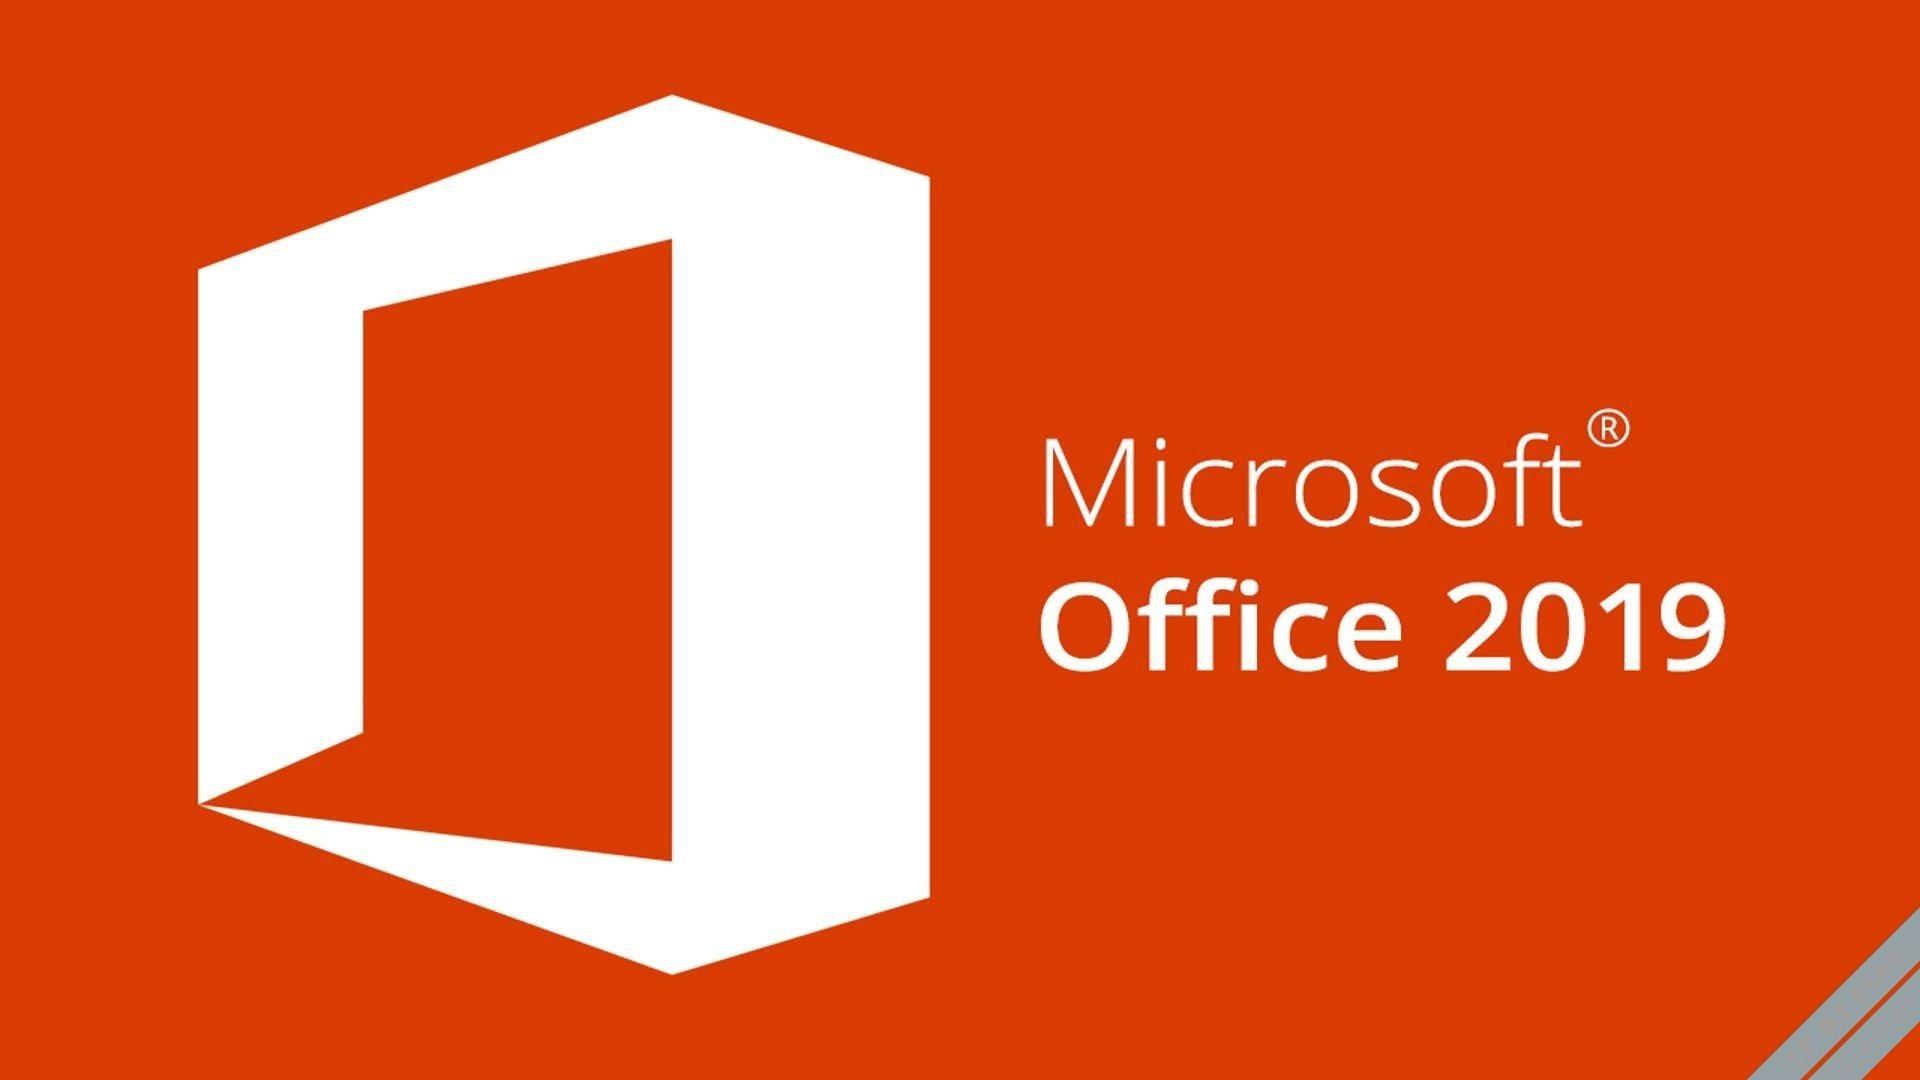 Download Microsoft Office 2019 Chính Thức